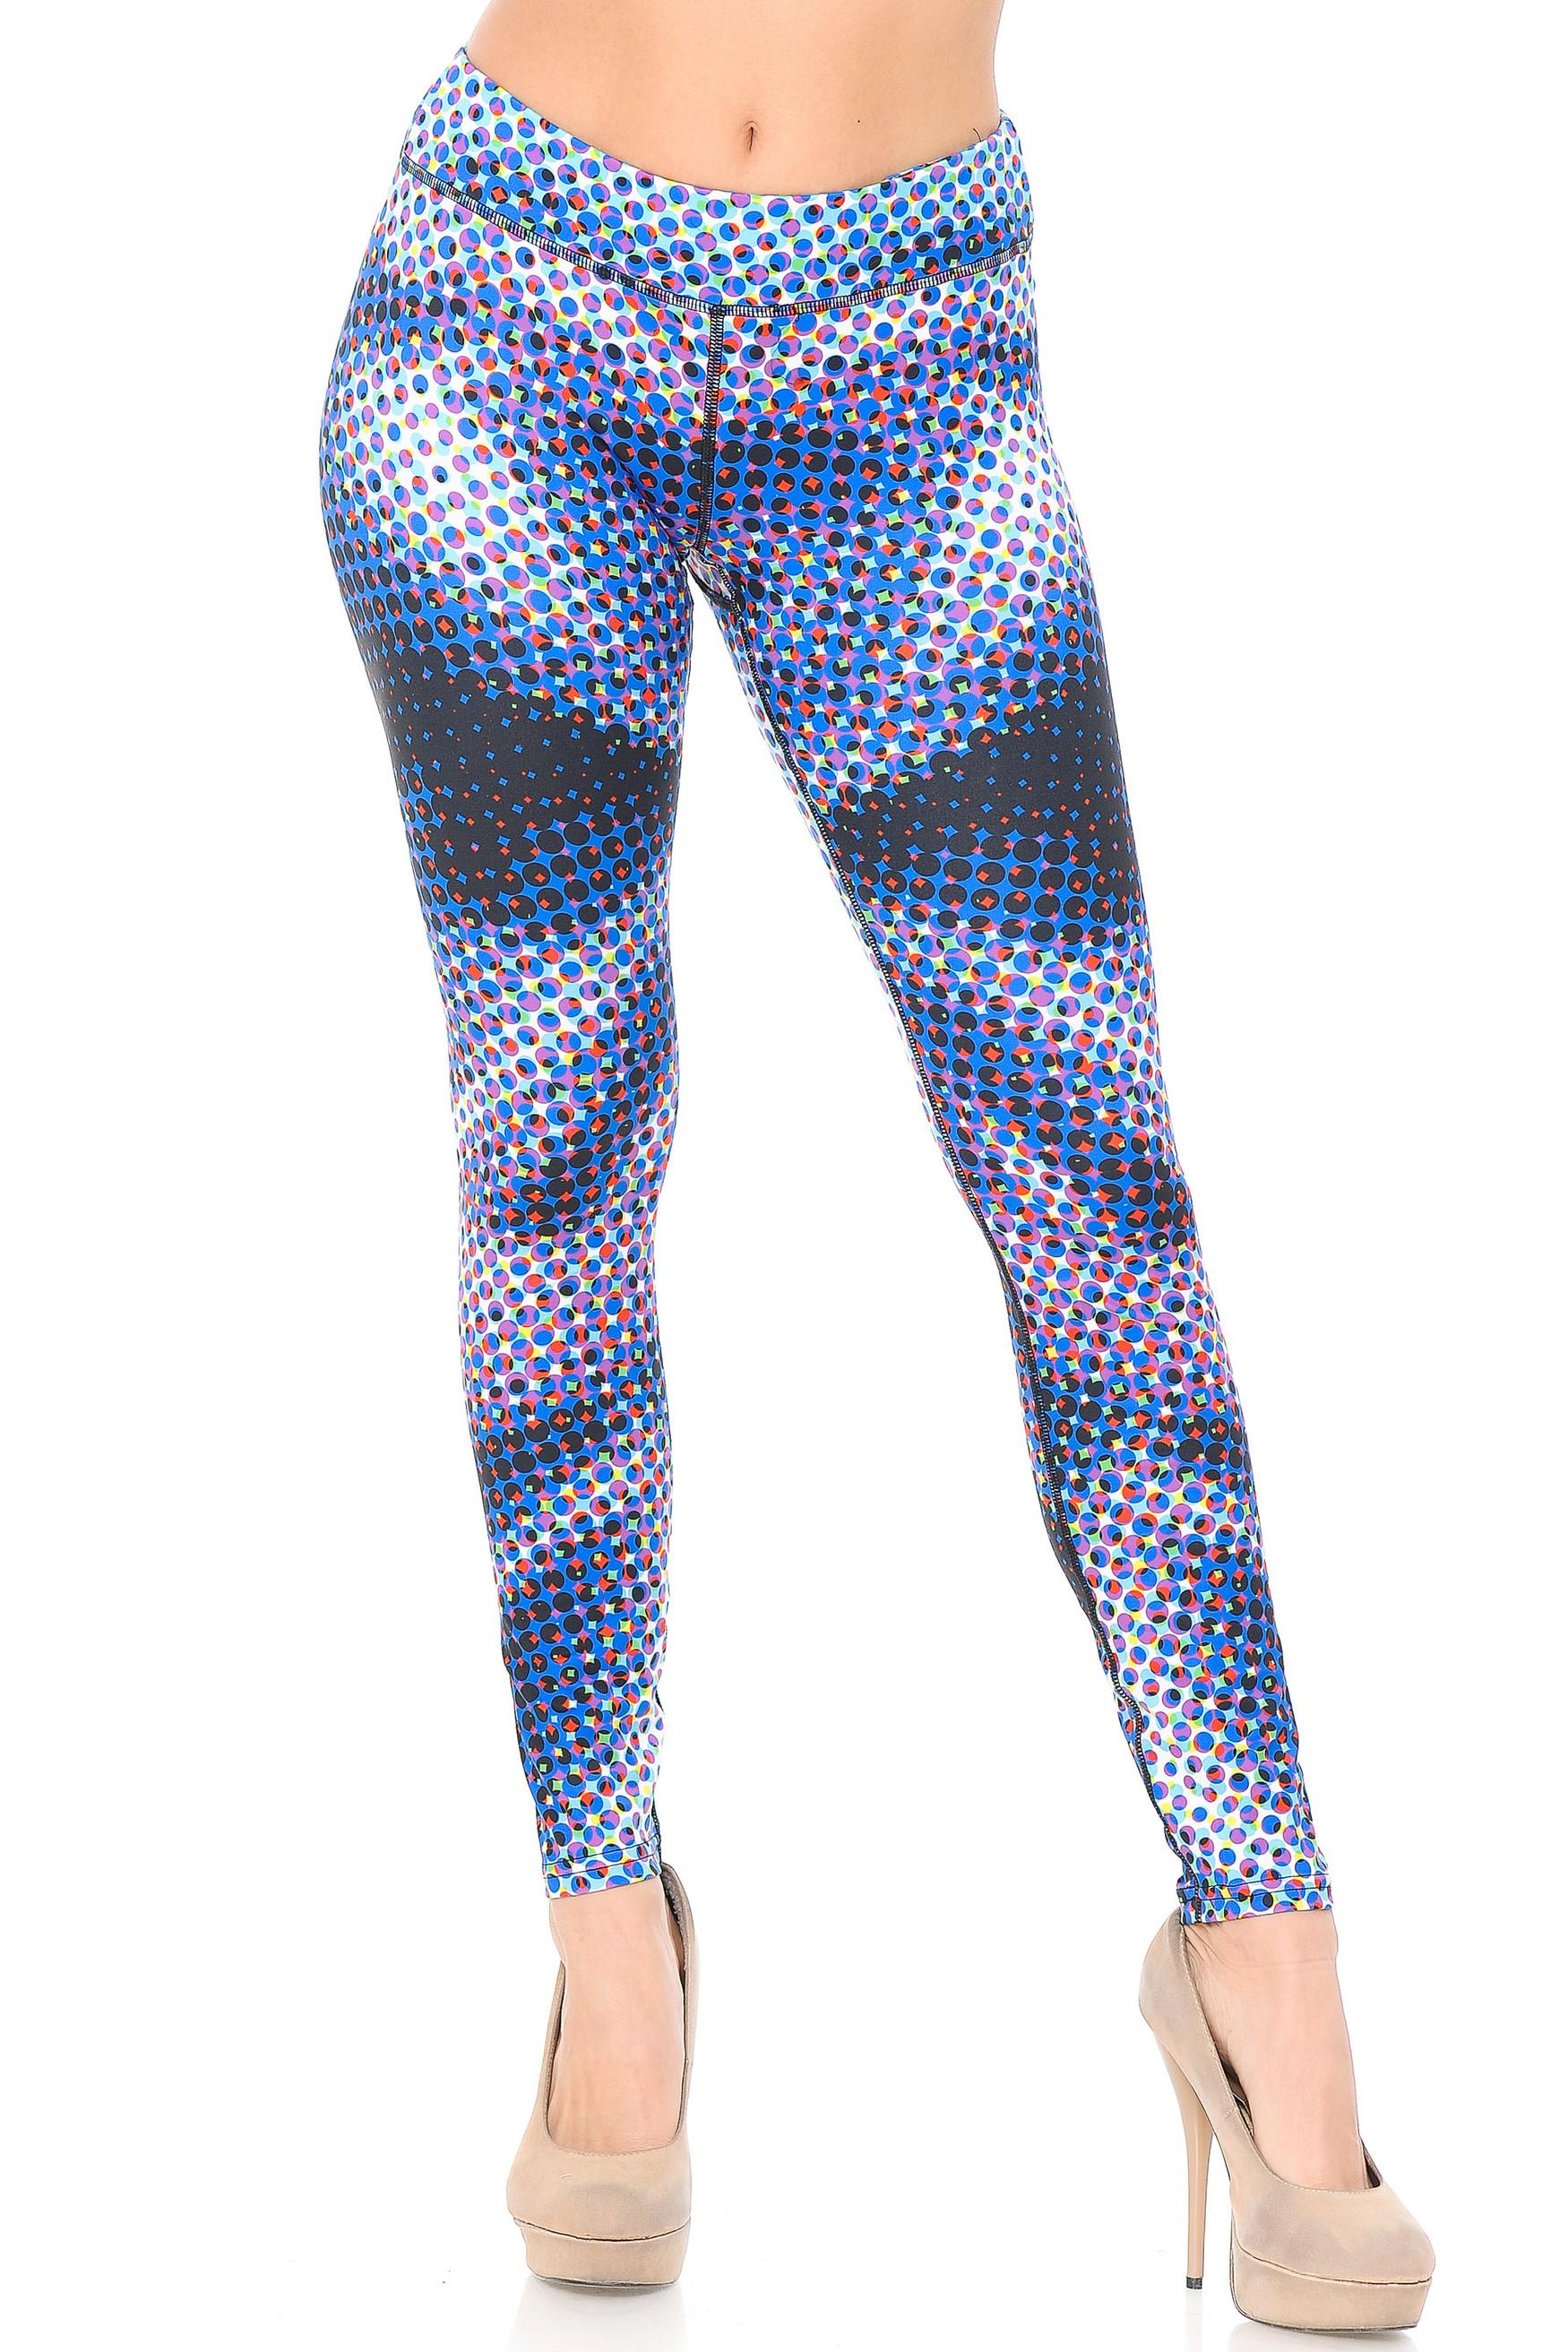 Double Brushed Polka Dot Hologram Leggings - 3 Inch Waistband